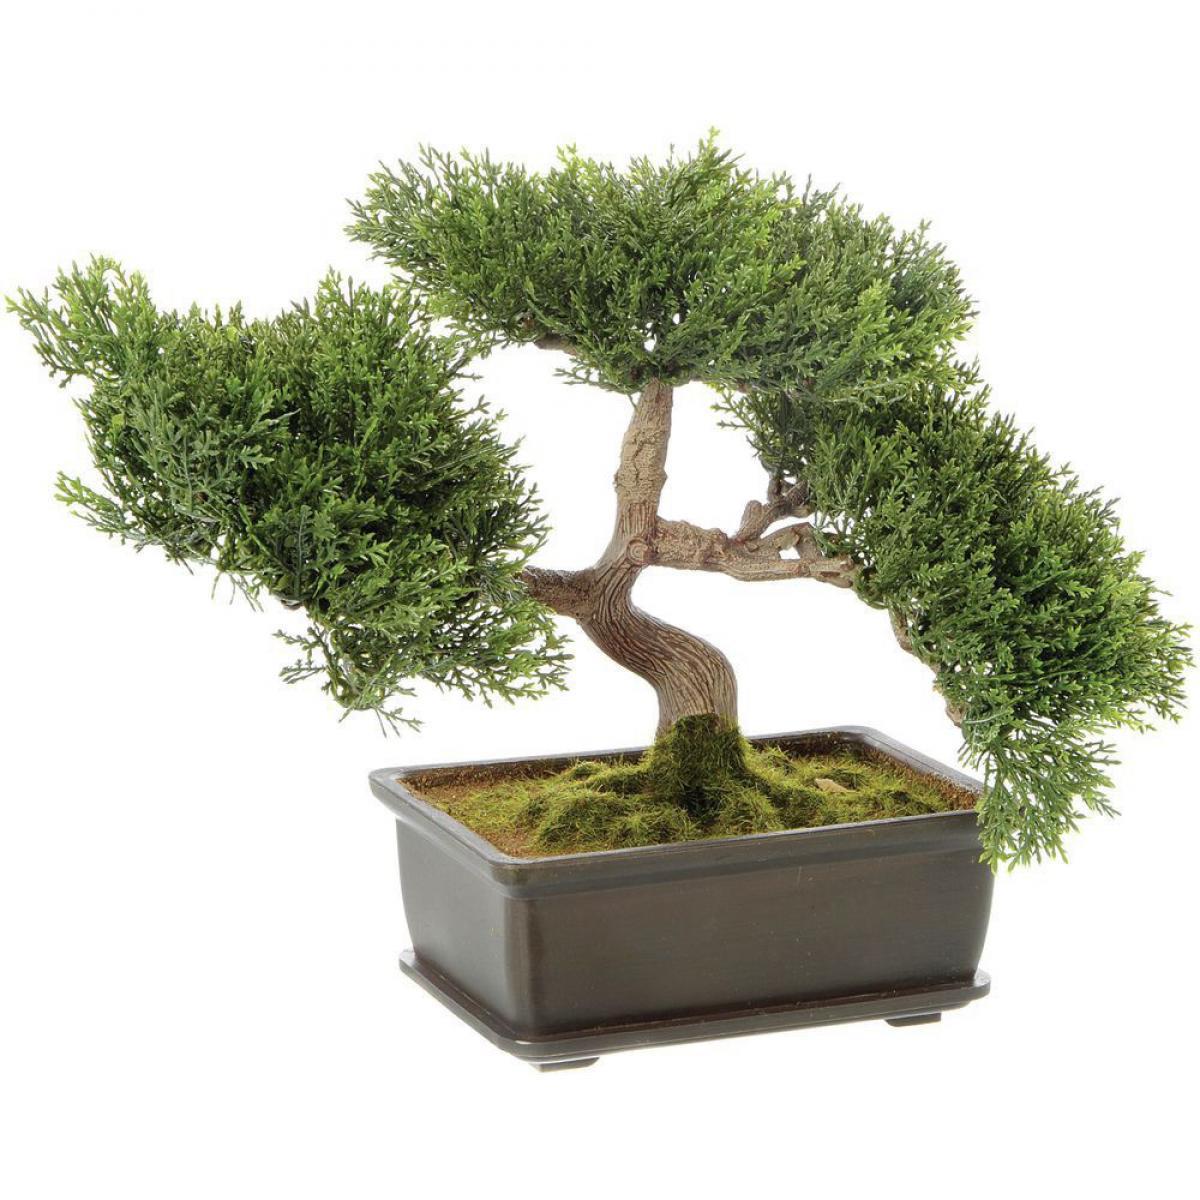 Artificial Bonsai Trees Artificial Japanese Tea Leaf Bonsai Tree